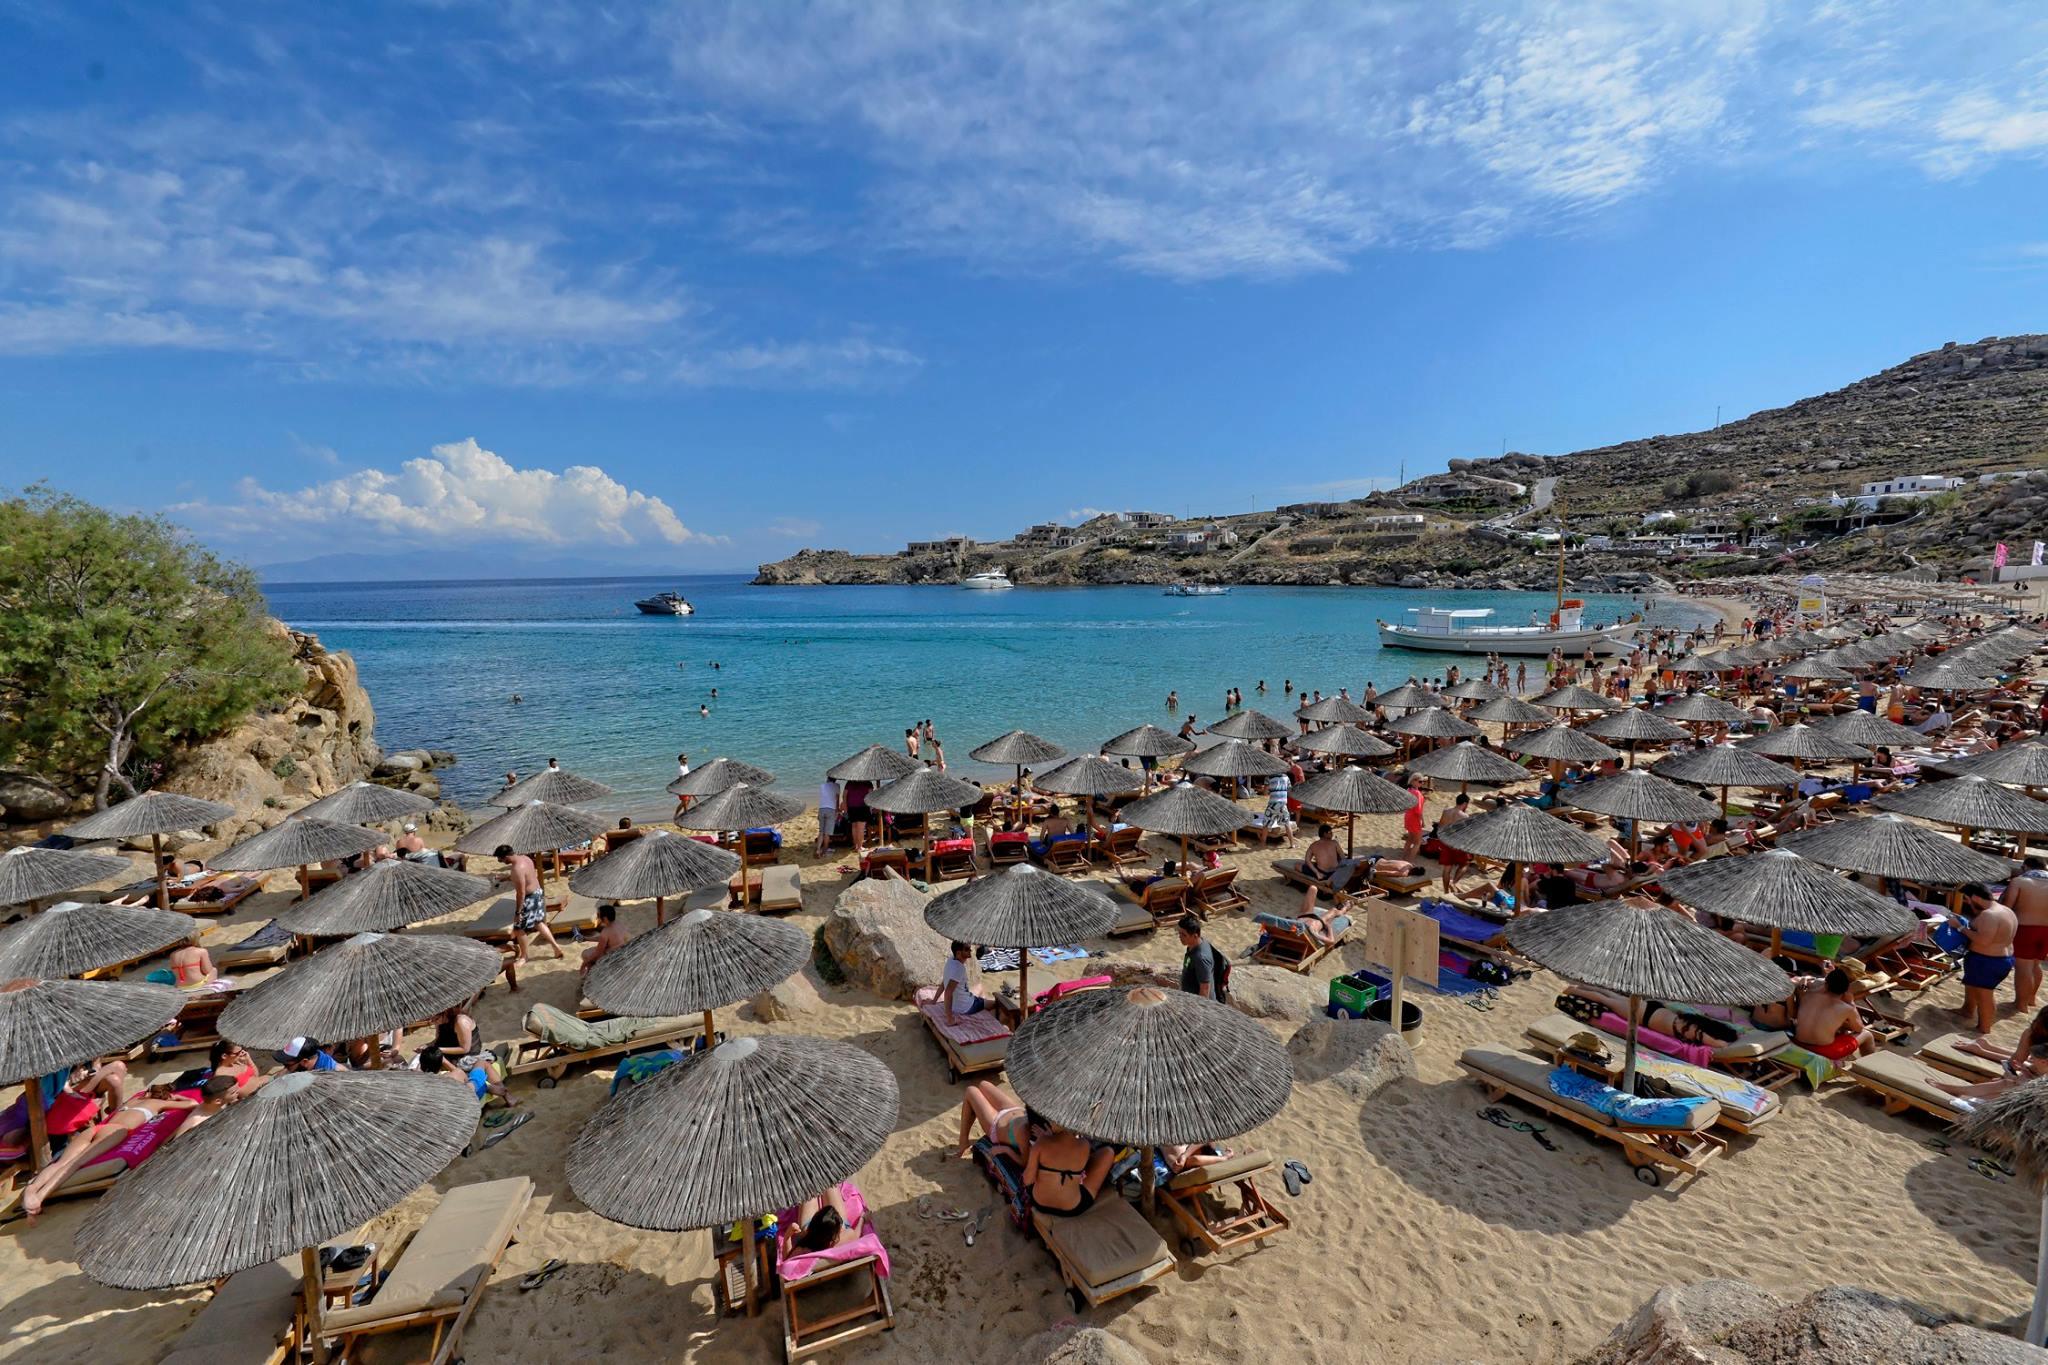 Best Island Beaches For Partying Mykonos St Barts: Super Paradise Beach In Mykonos Island, Greece